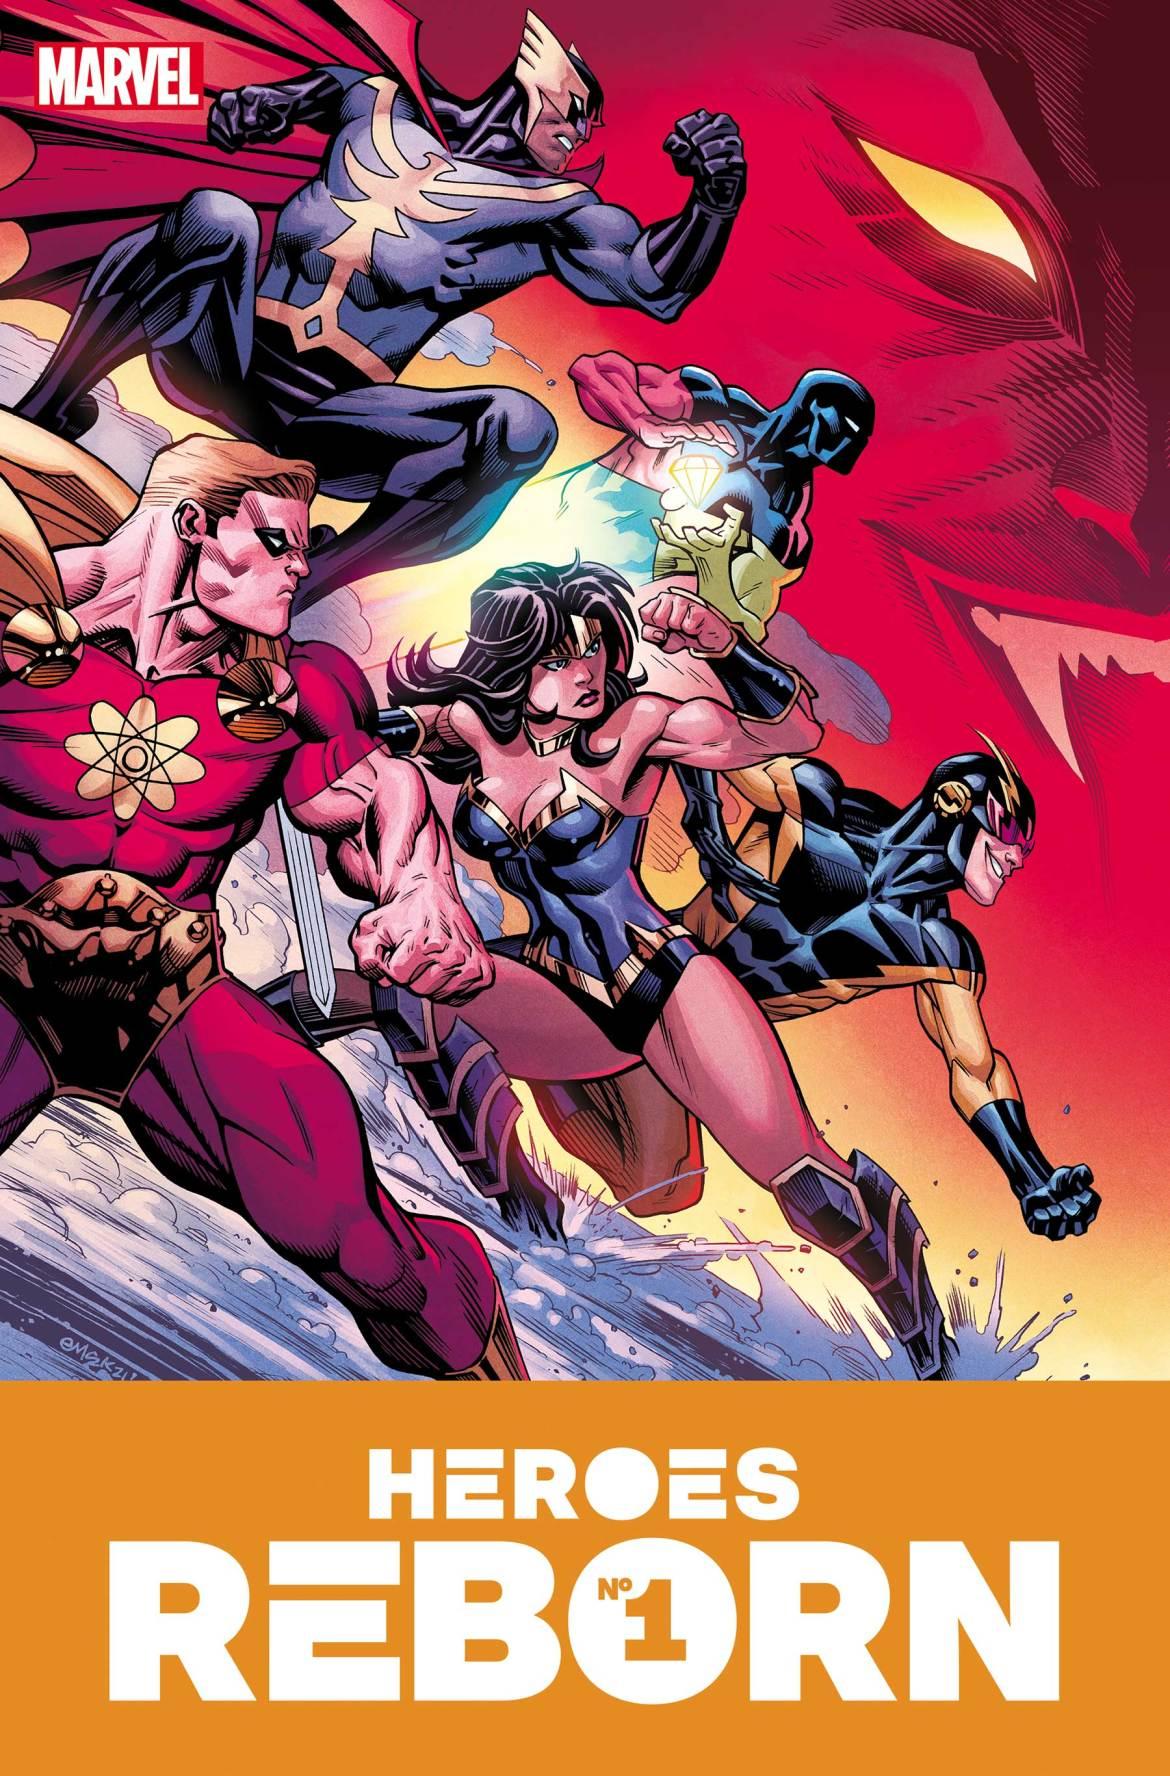 HEROESREBORN2021001_McGuinness_Var Marvel Comics May 2021 Solicitations